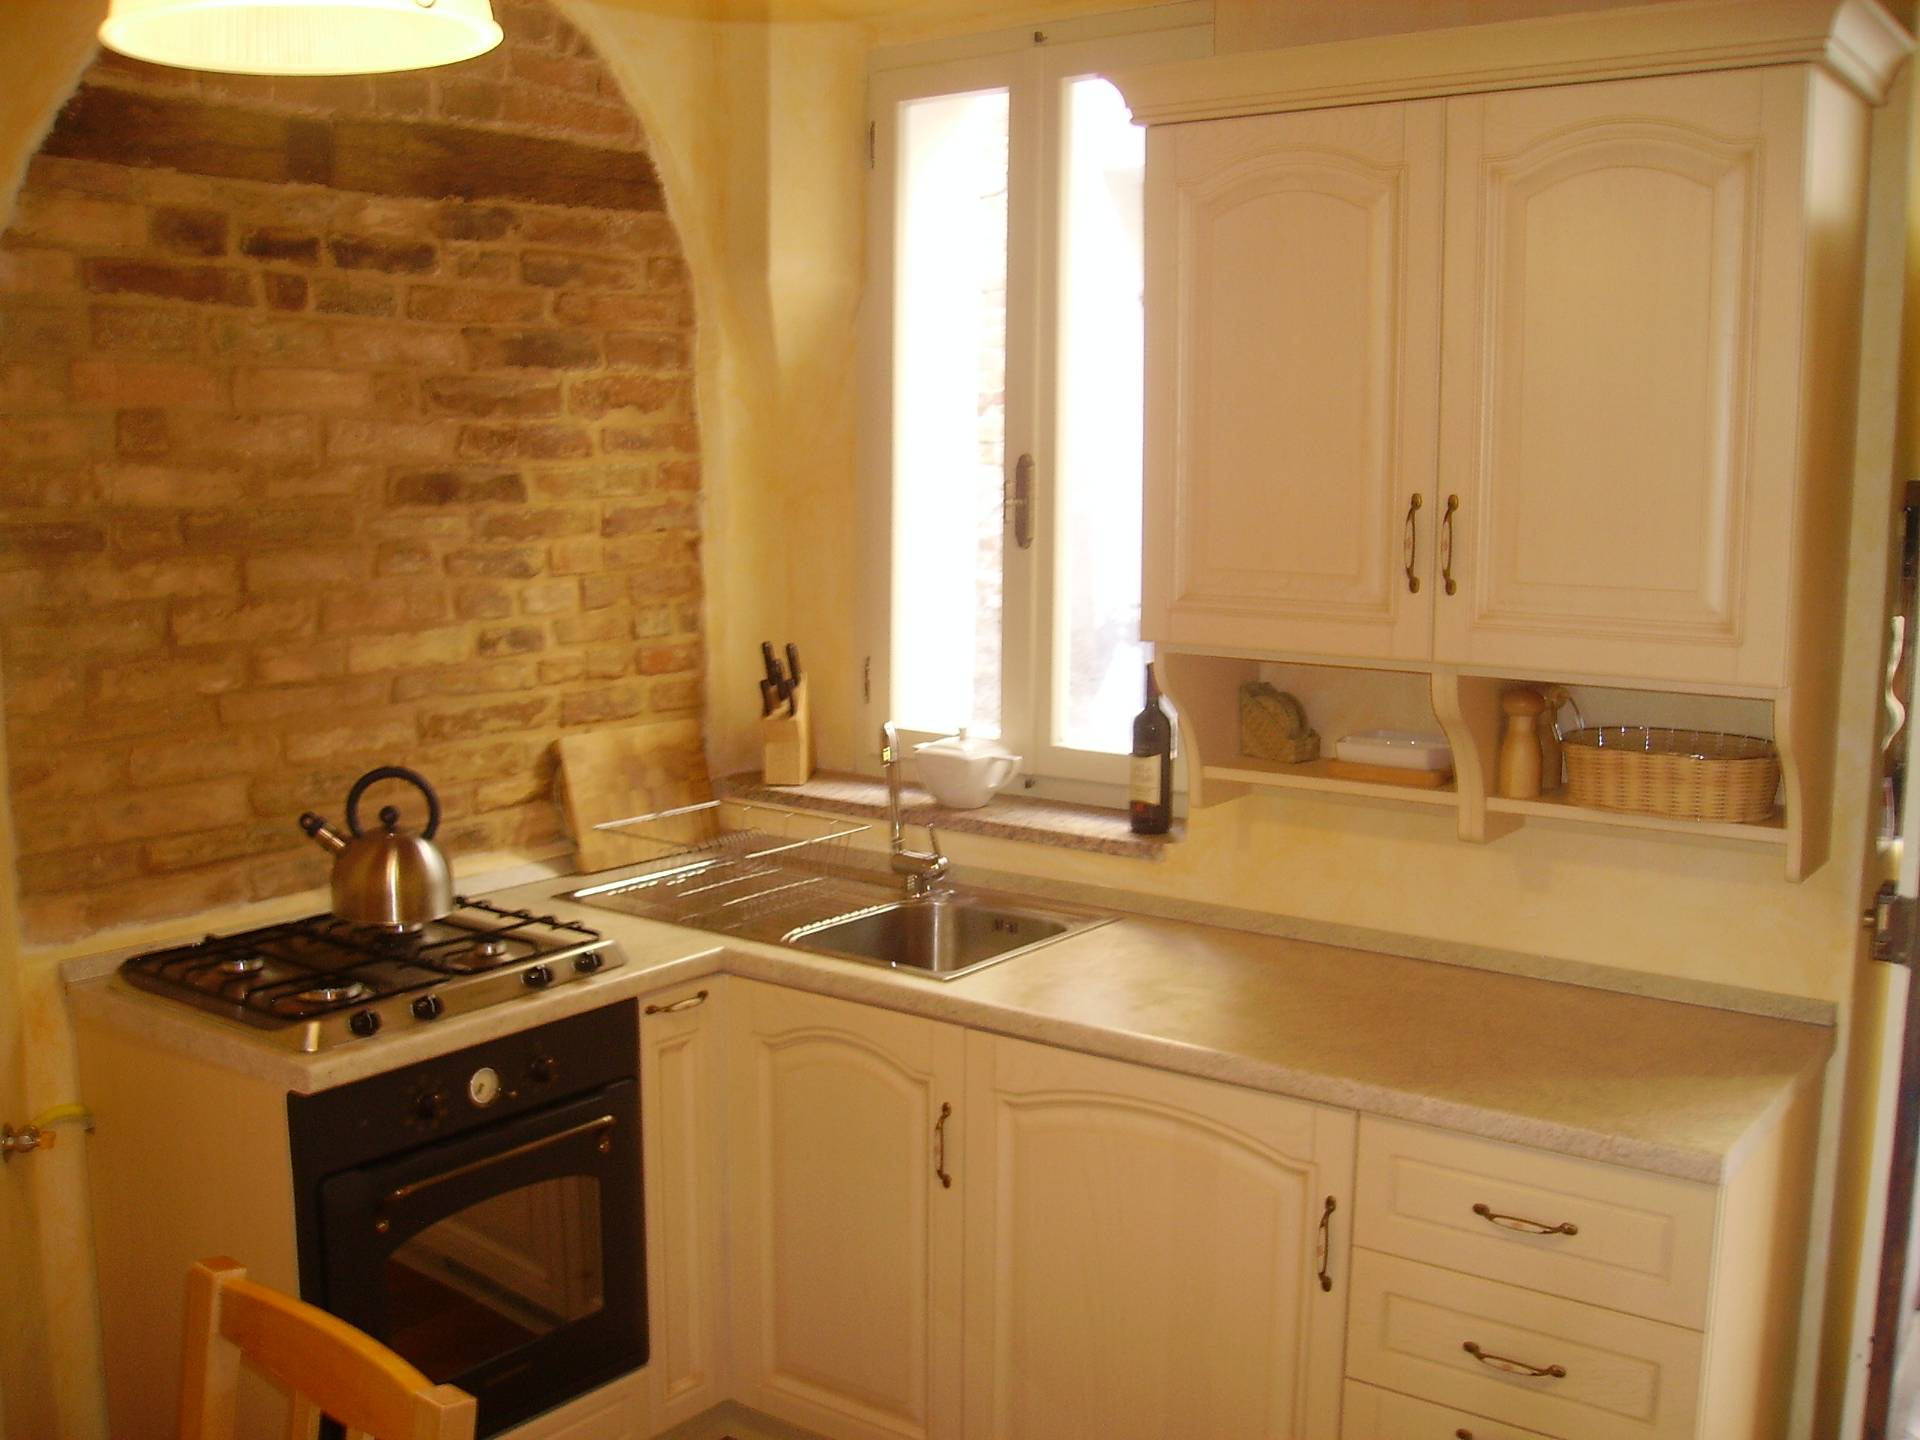 Casa a Montedinove (Ascoli Piceno)